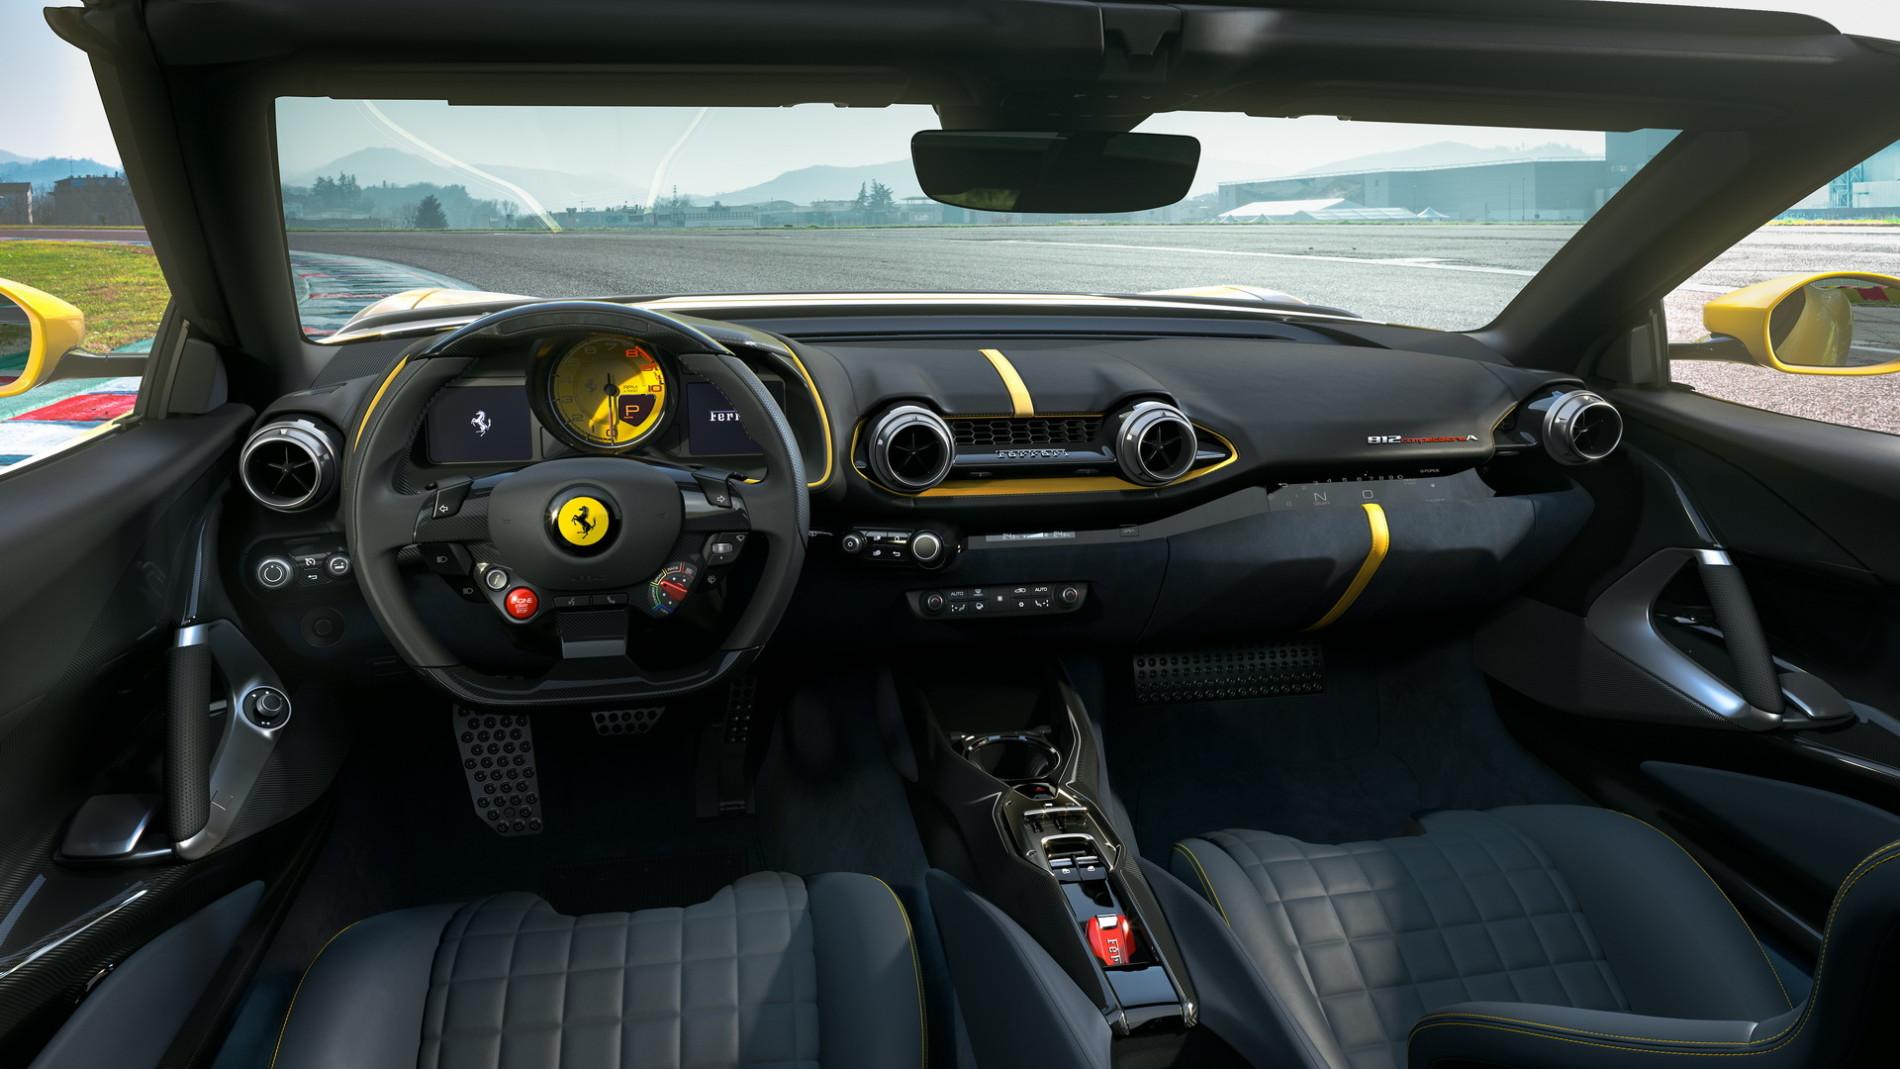 Ferrari 812 Competizione si Ferrari 812 Competizione A - Ferrari 812 Competizione si Ferrari 812 Competizione A